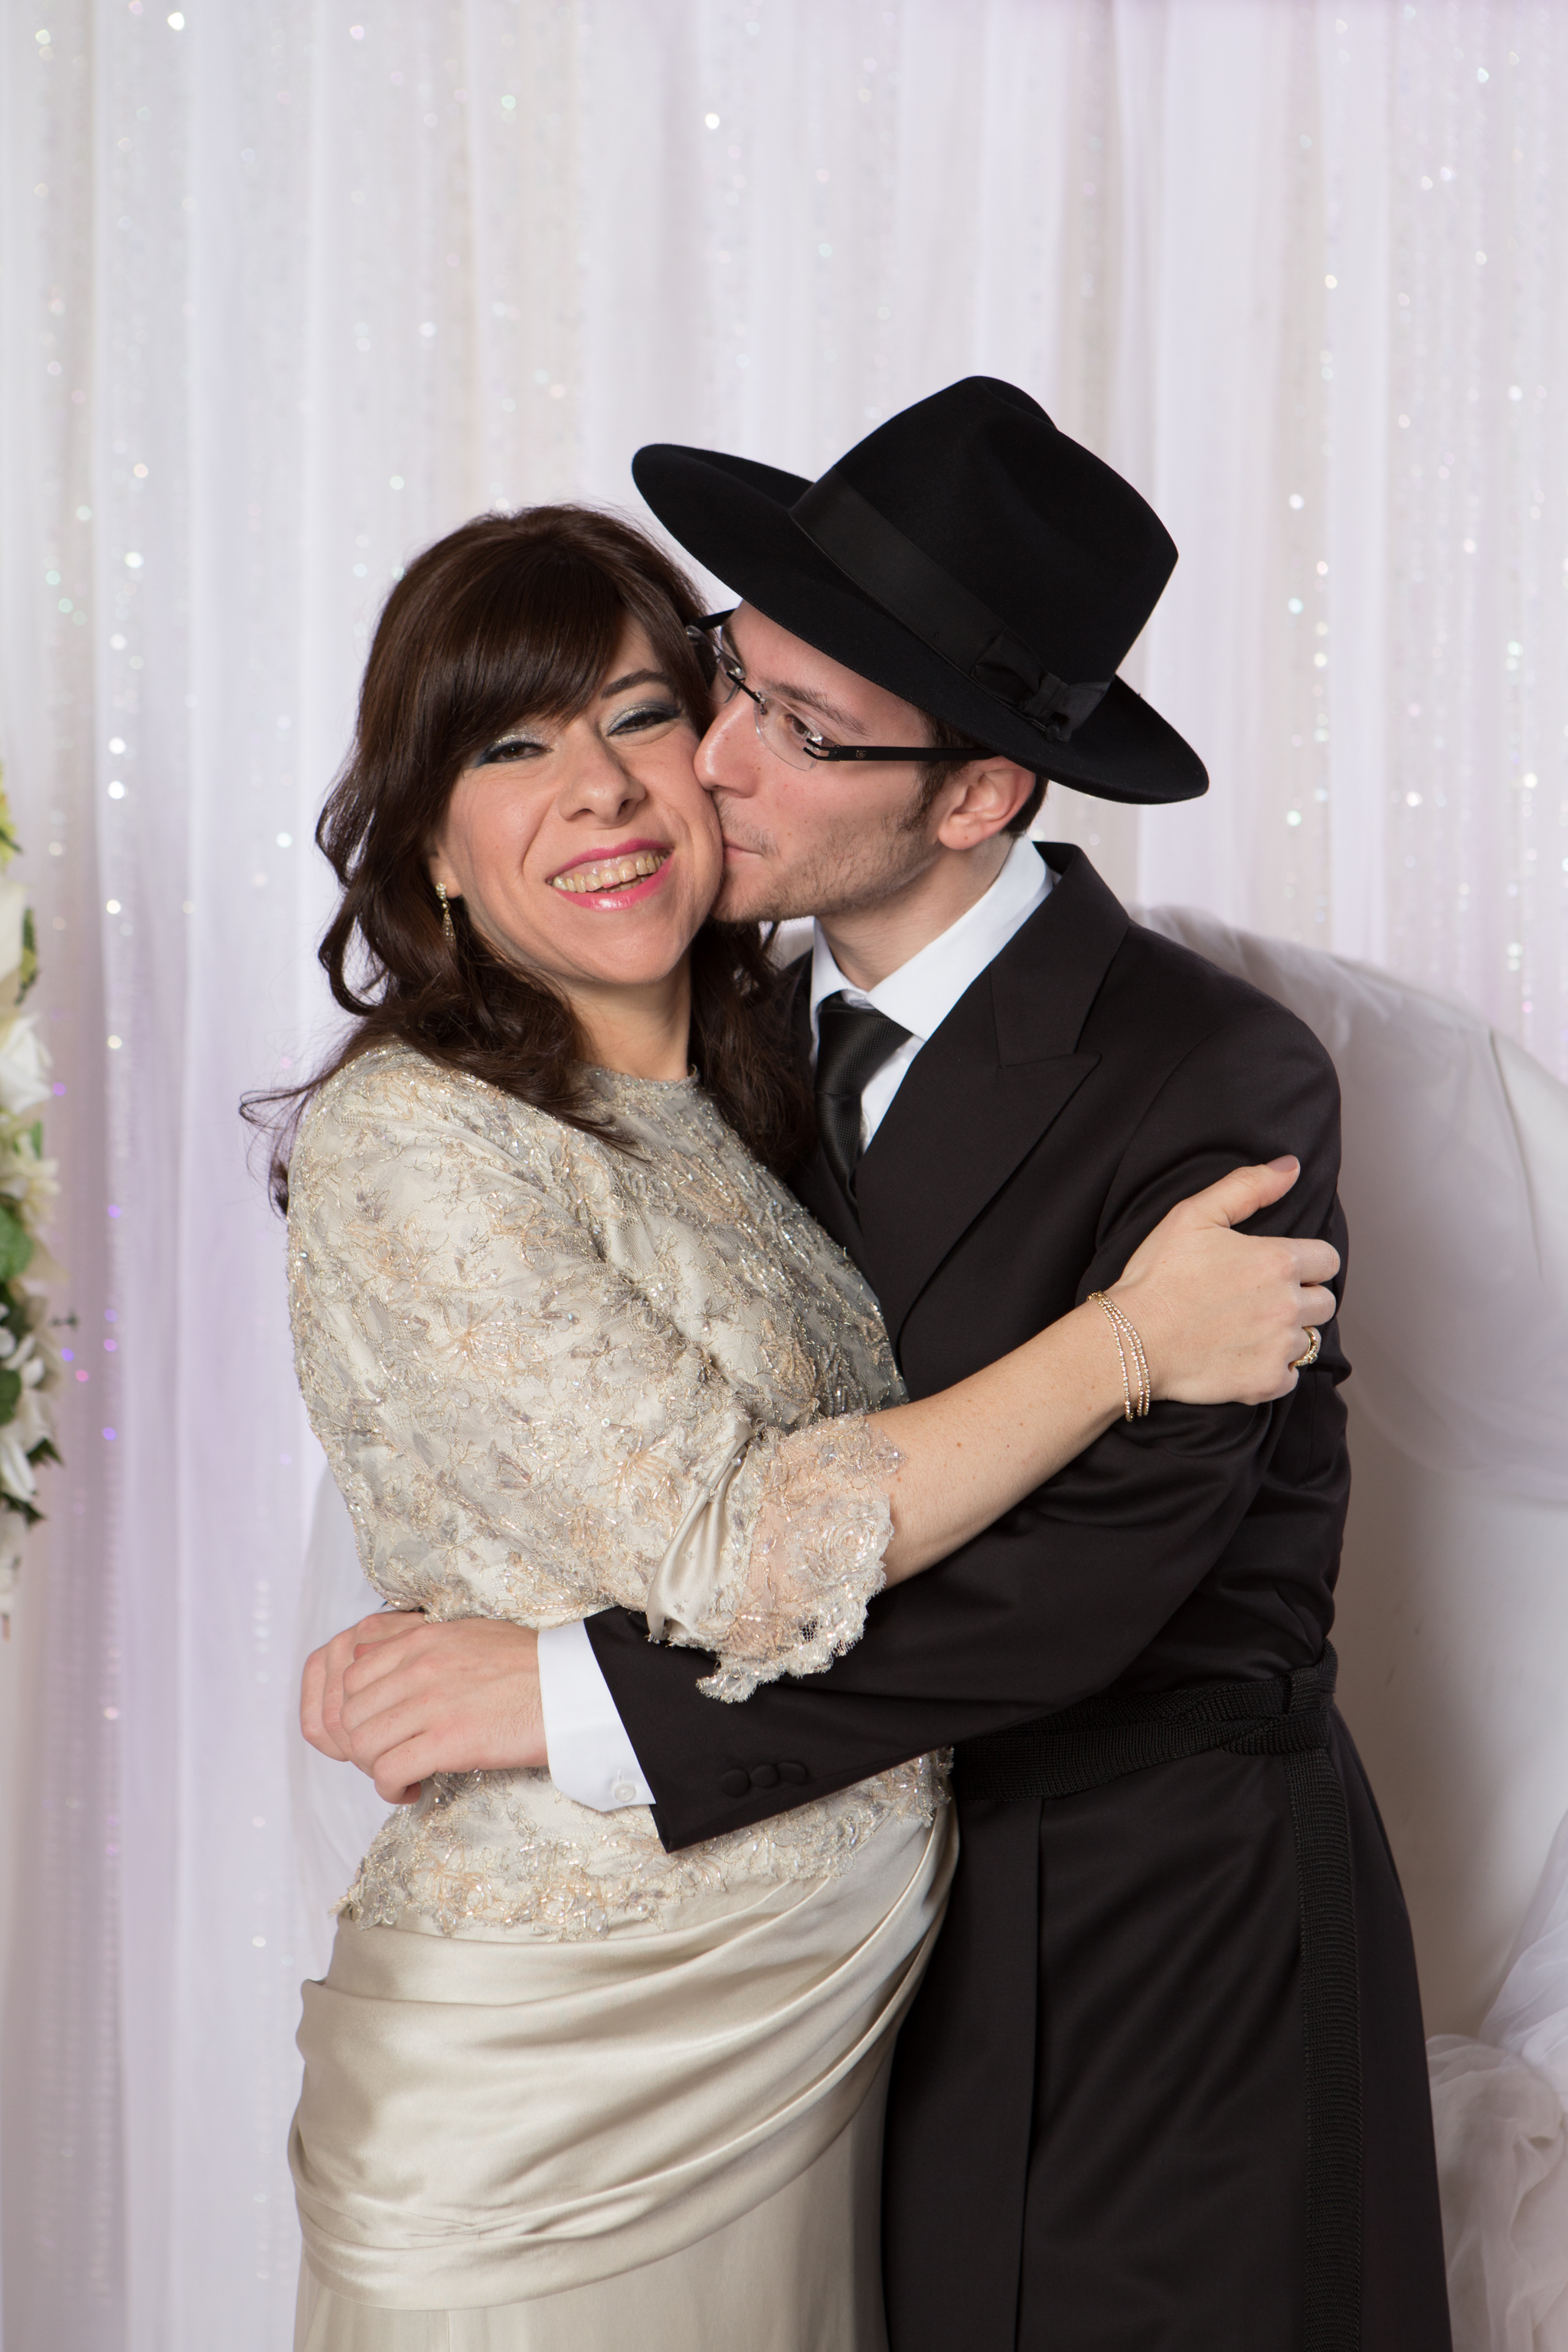 Wedding Iossi and Gitty Khafif  - Eliau Piha studio photography, new york, events, people 770 brooklyn -0184.jpg